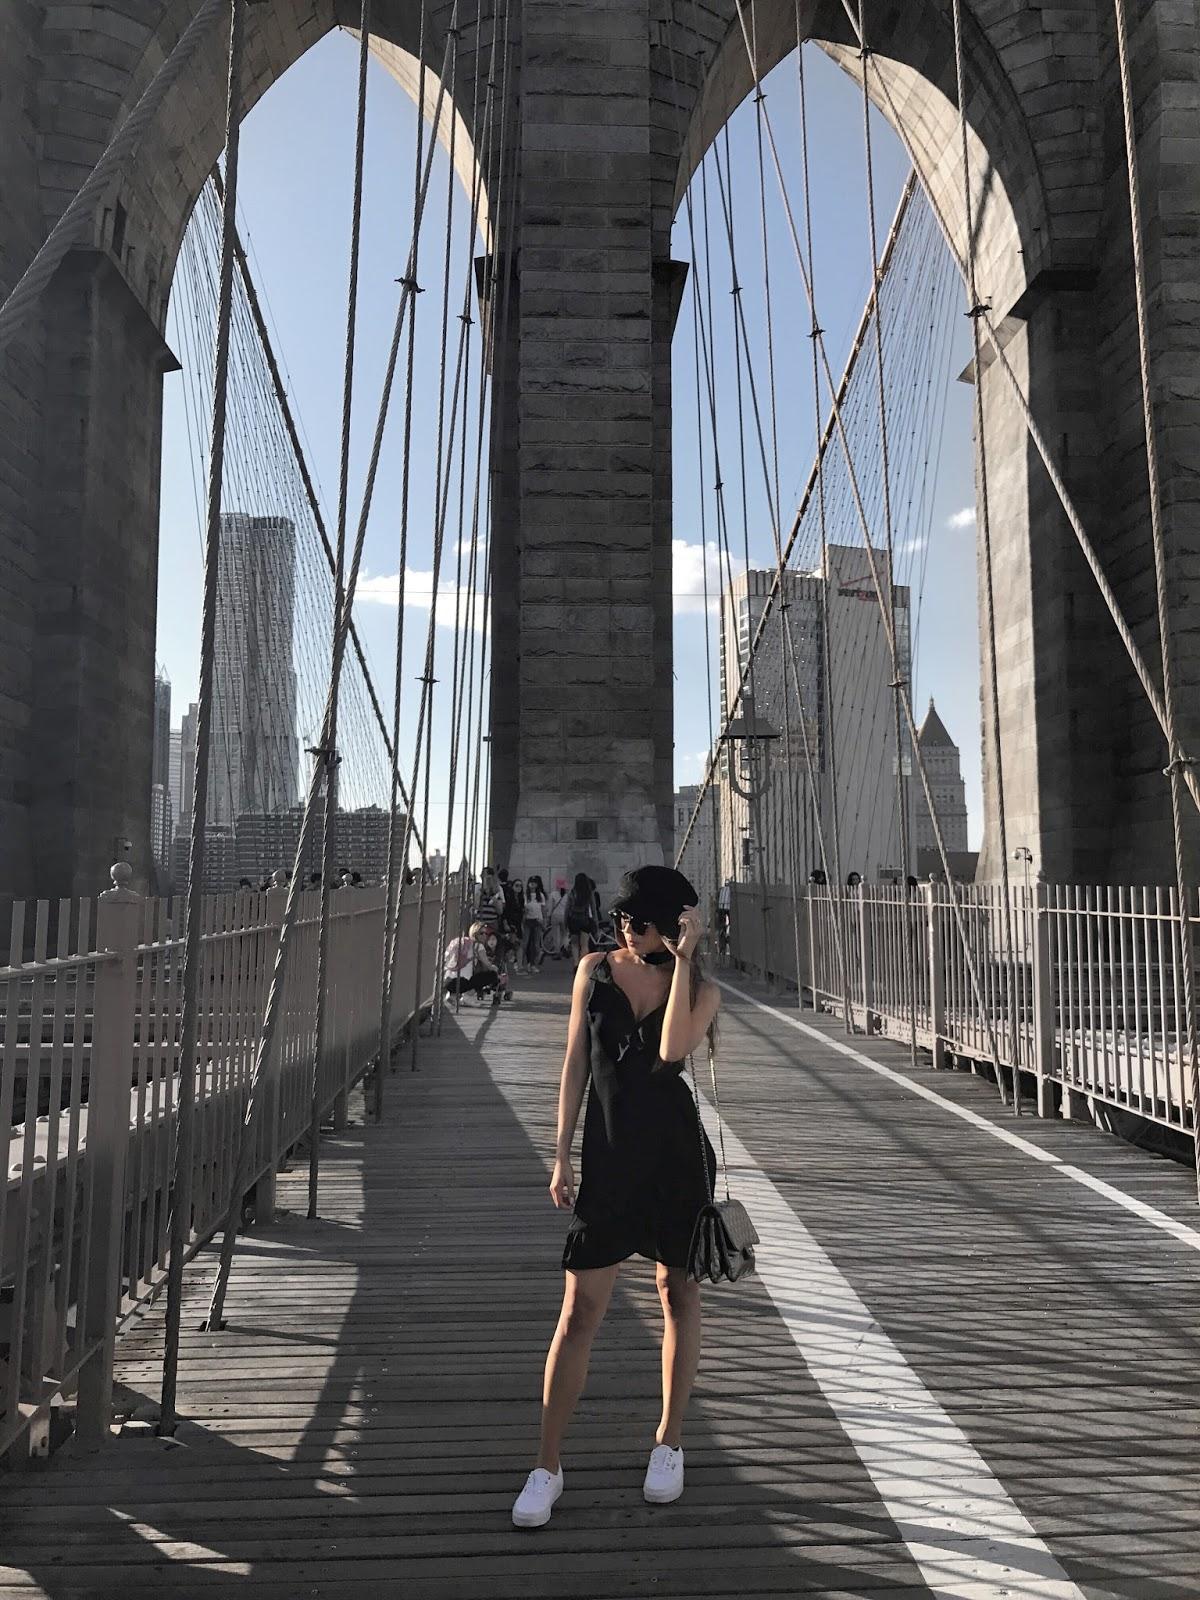 New York Fashion Week SpringSummer 2018 Day 2: Media Lounge